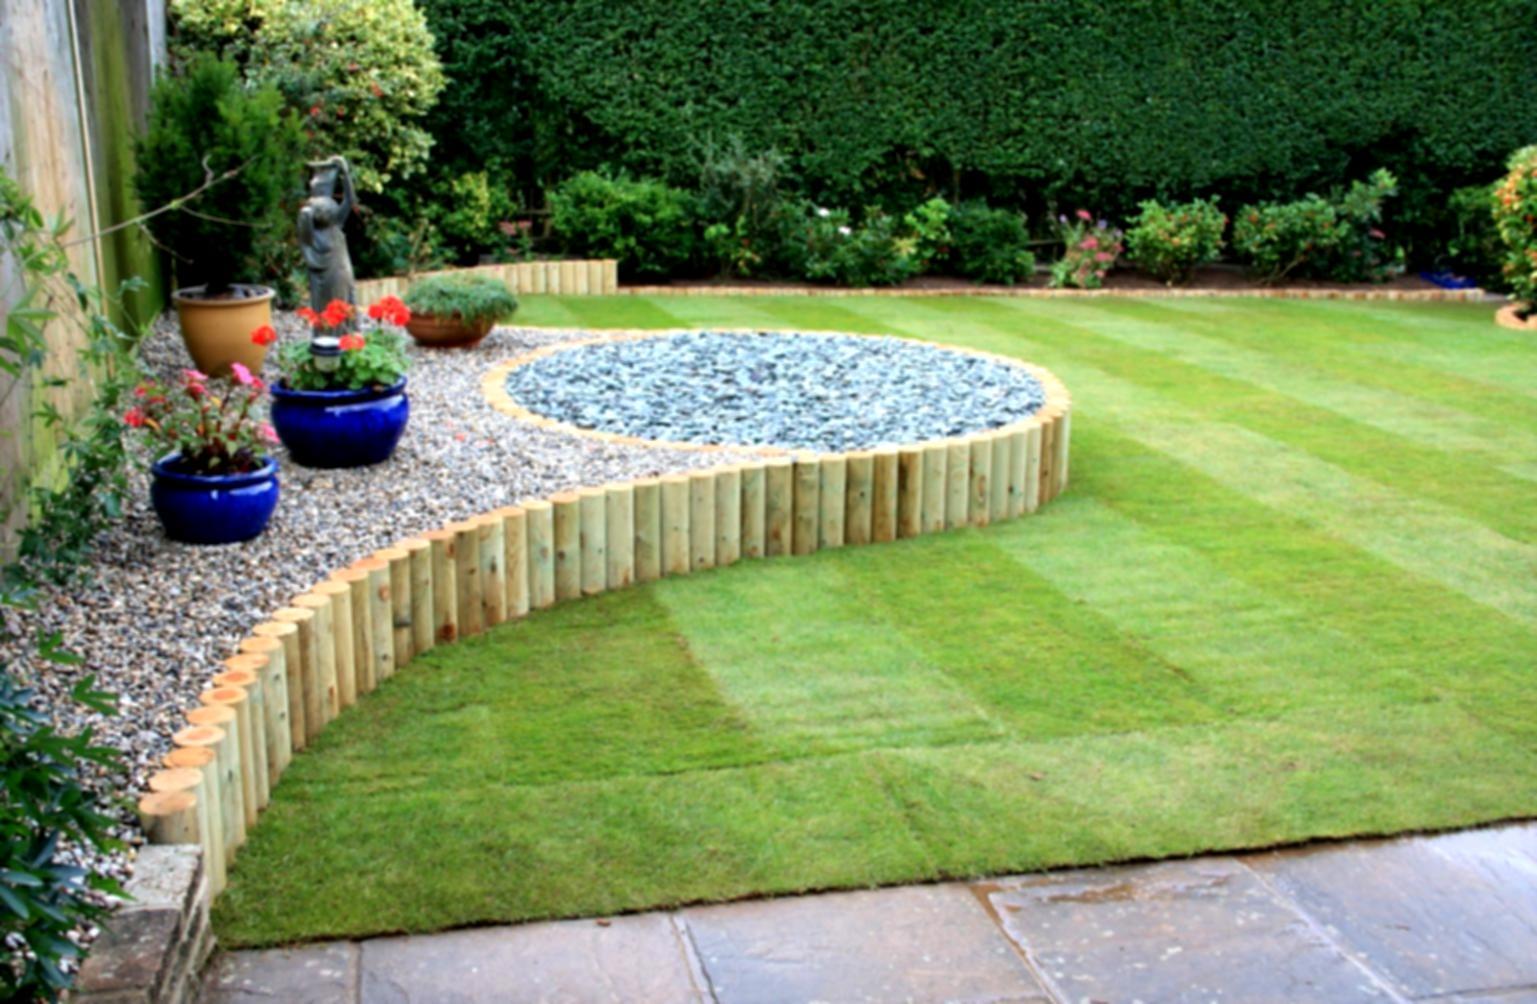 Landscape ideas for the backyard simple design landscaping idea basic garden shed ZBDJMSZ